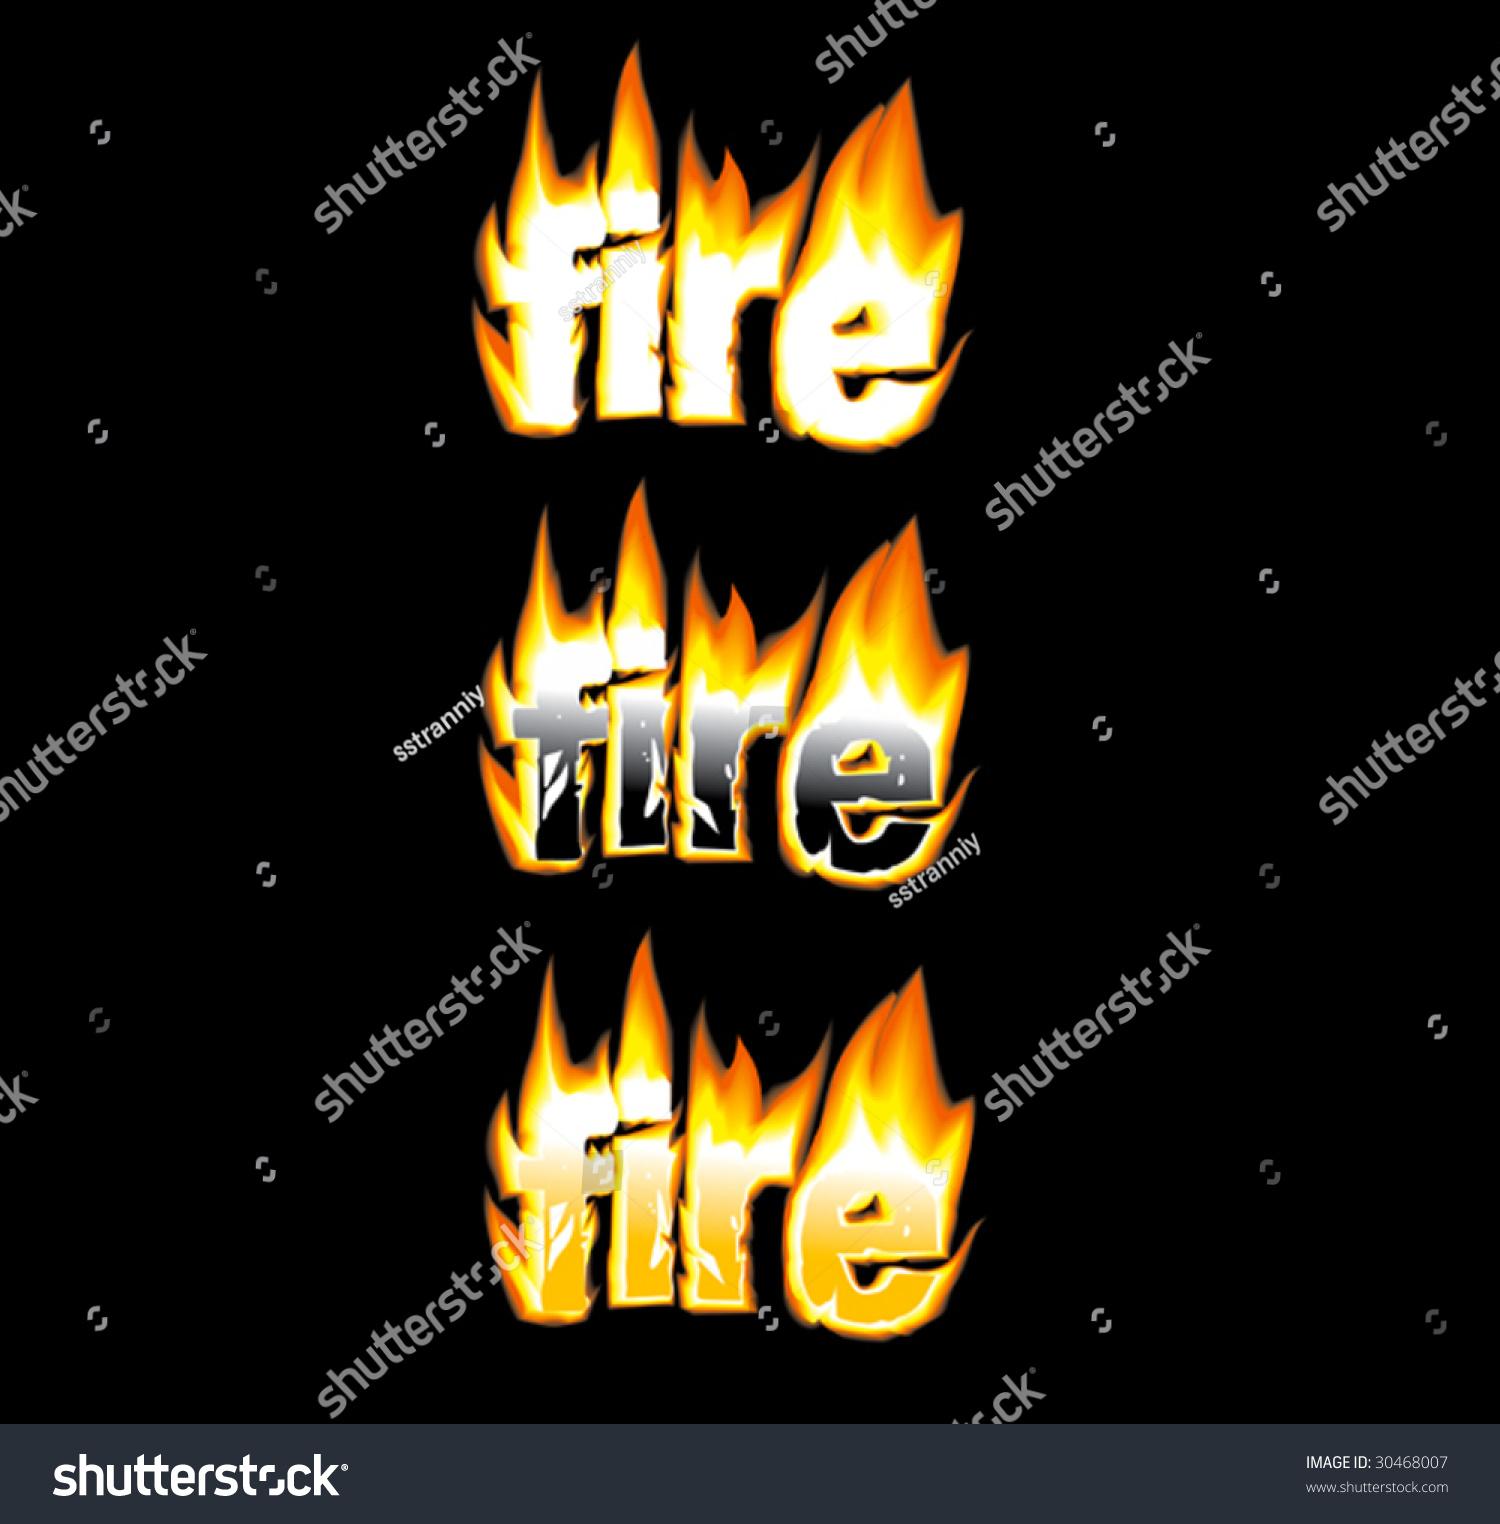 Word on Fire Blog Word on Fire - mandegar info